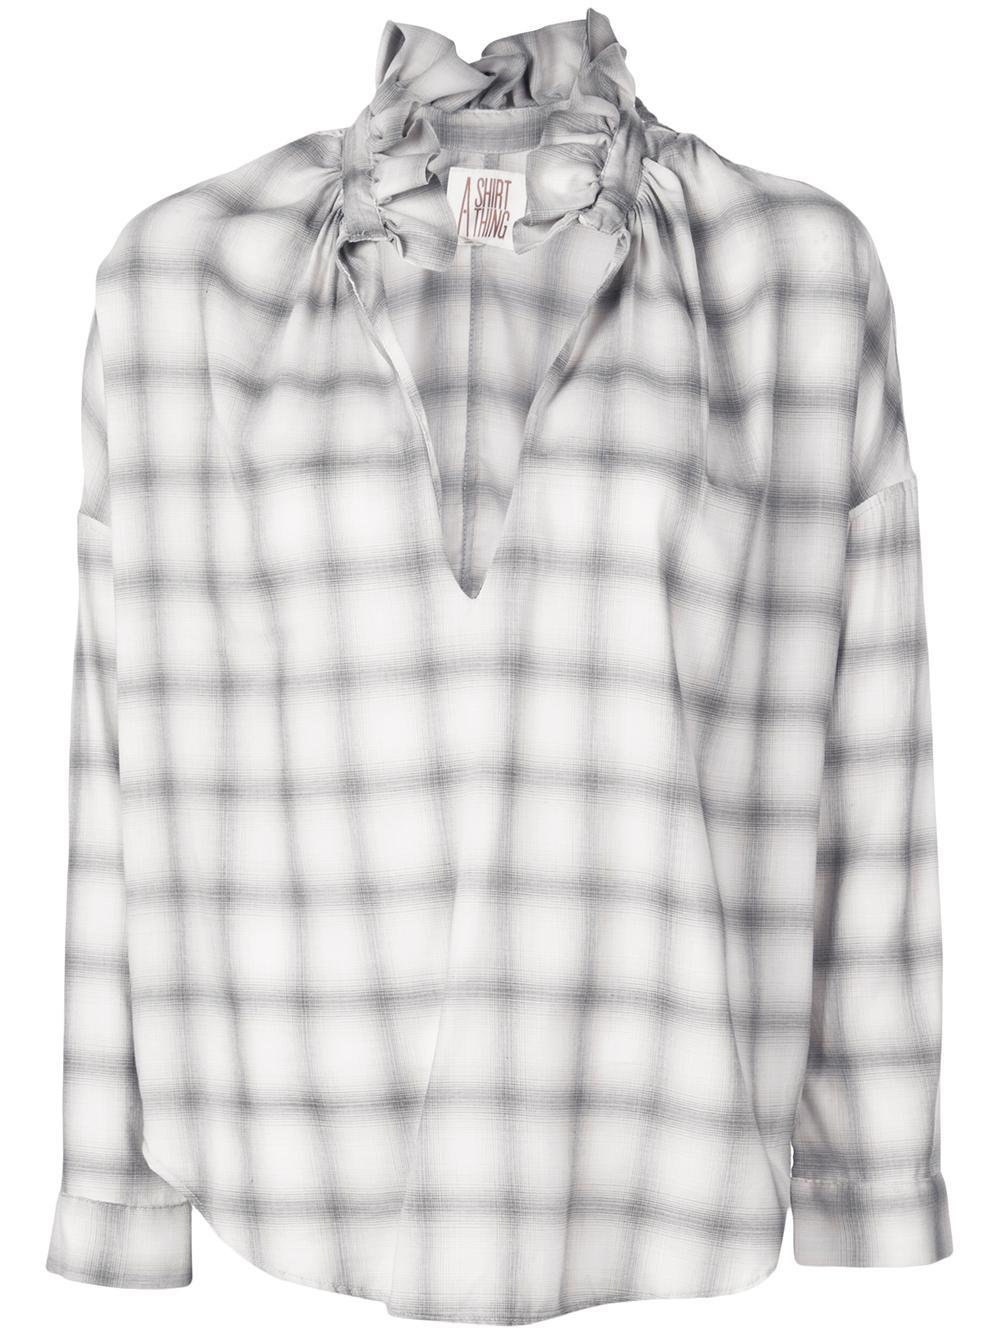 Penelope Soft Plaid Shirt Soft Ruffle Collar